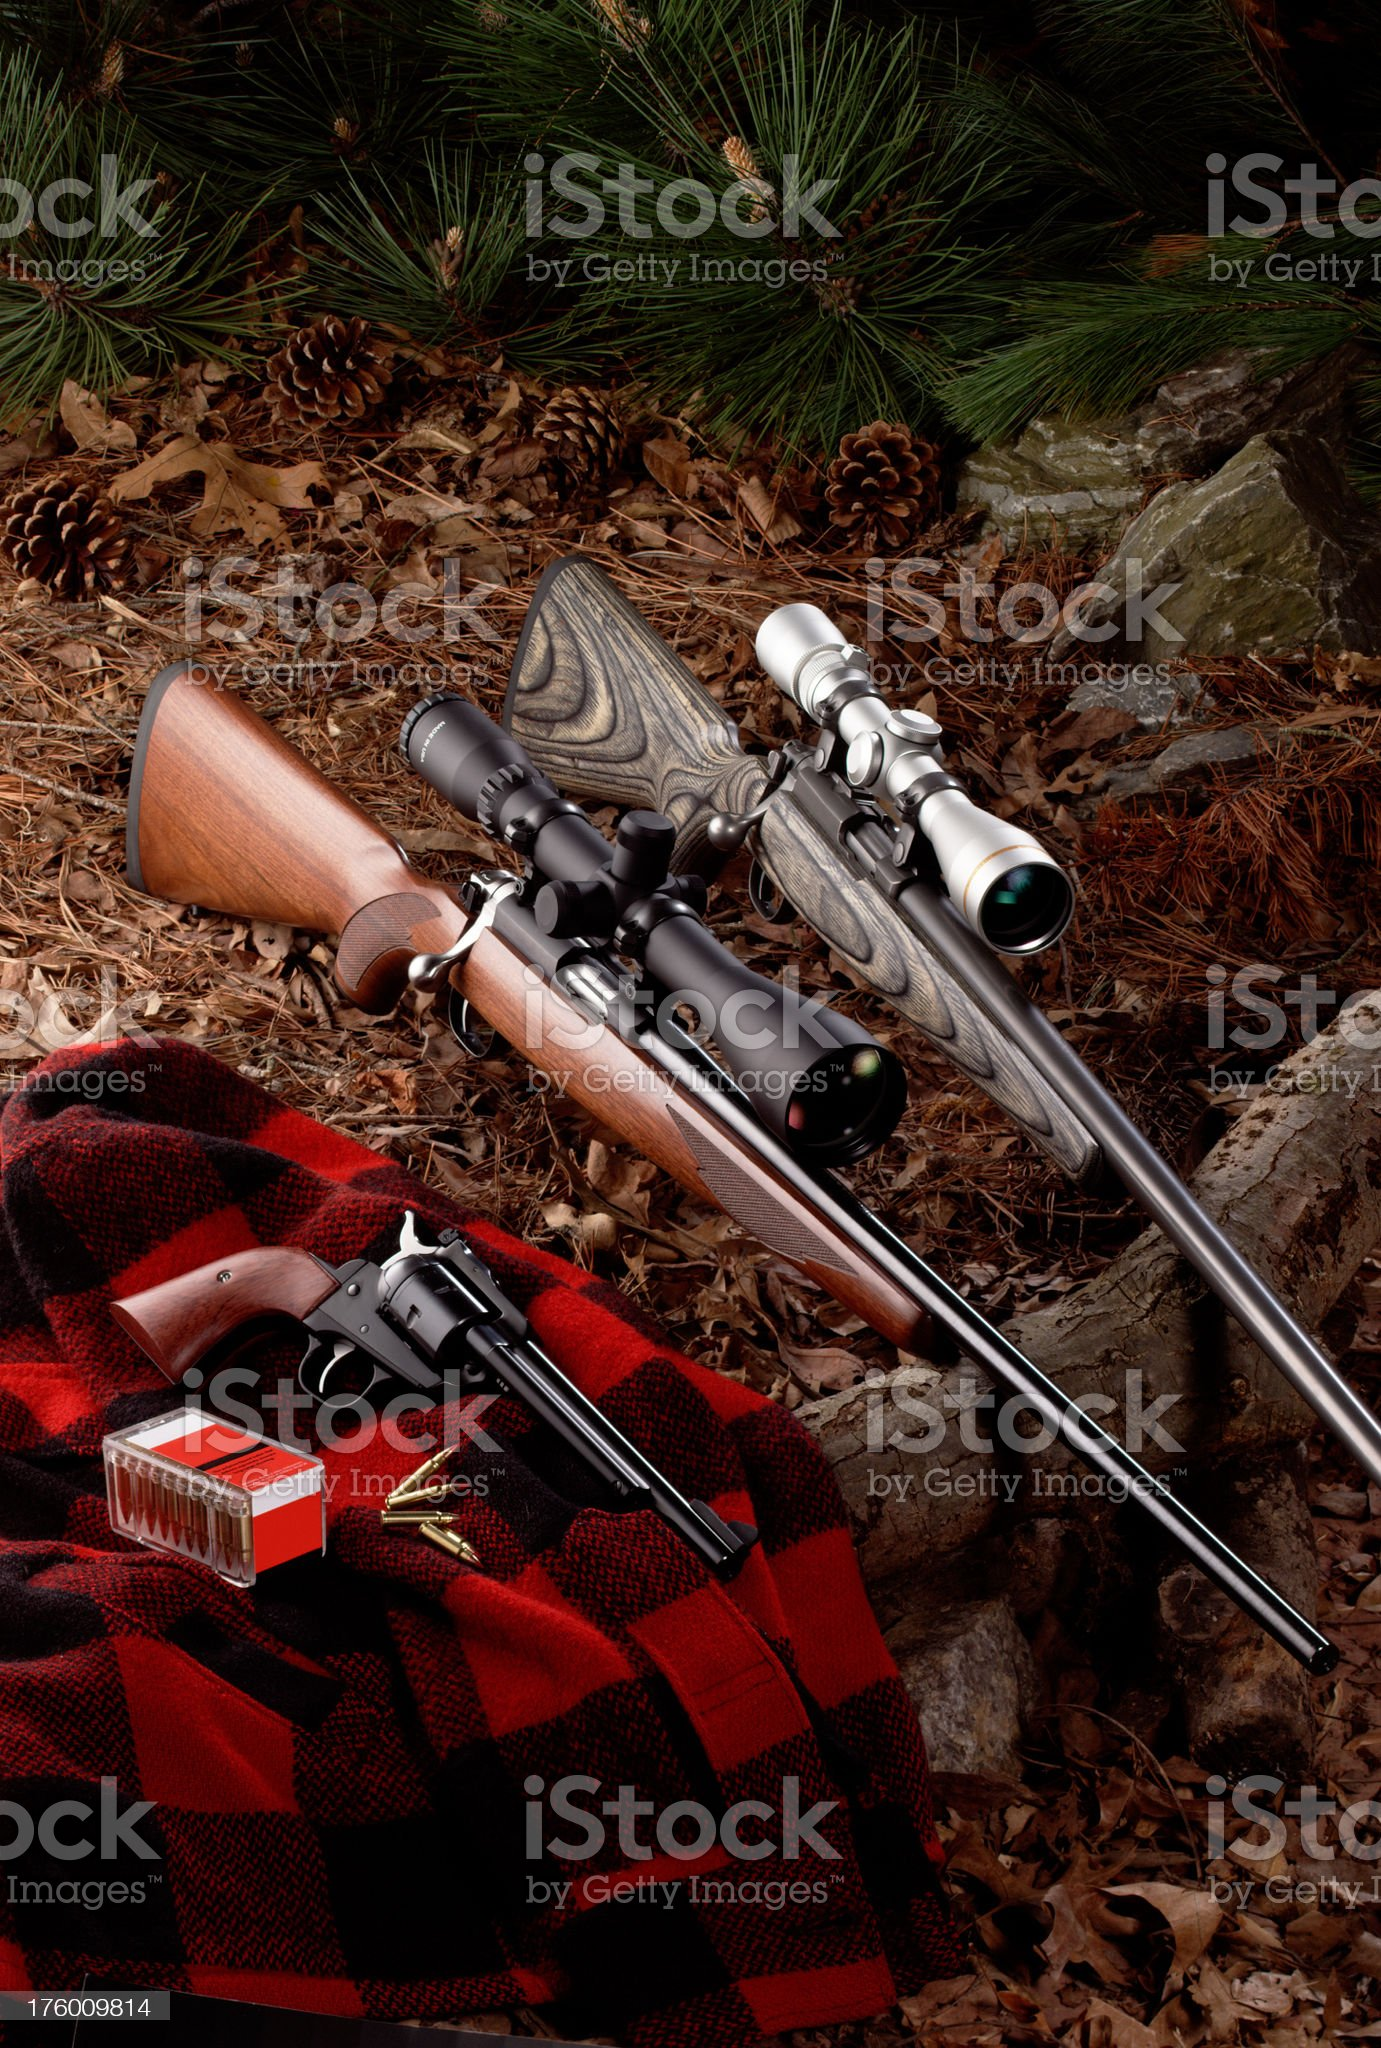 Hunting Rifles royalty-free stock photo